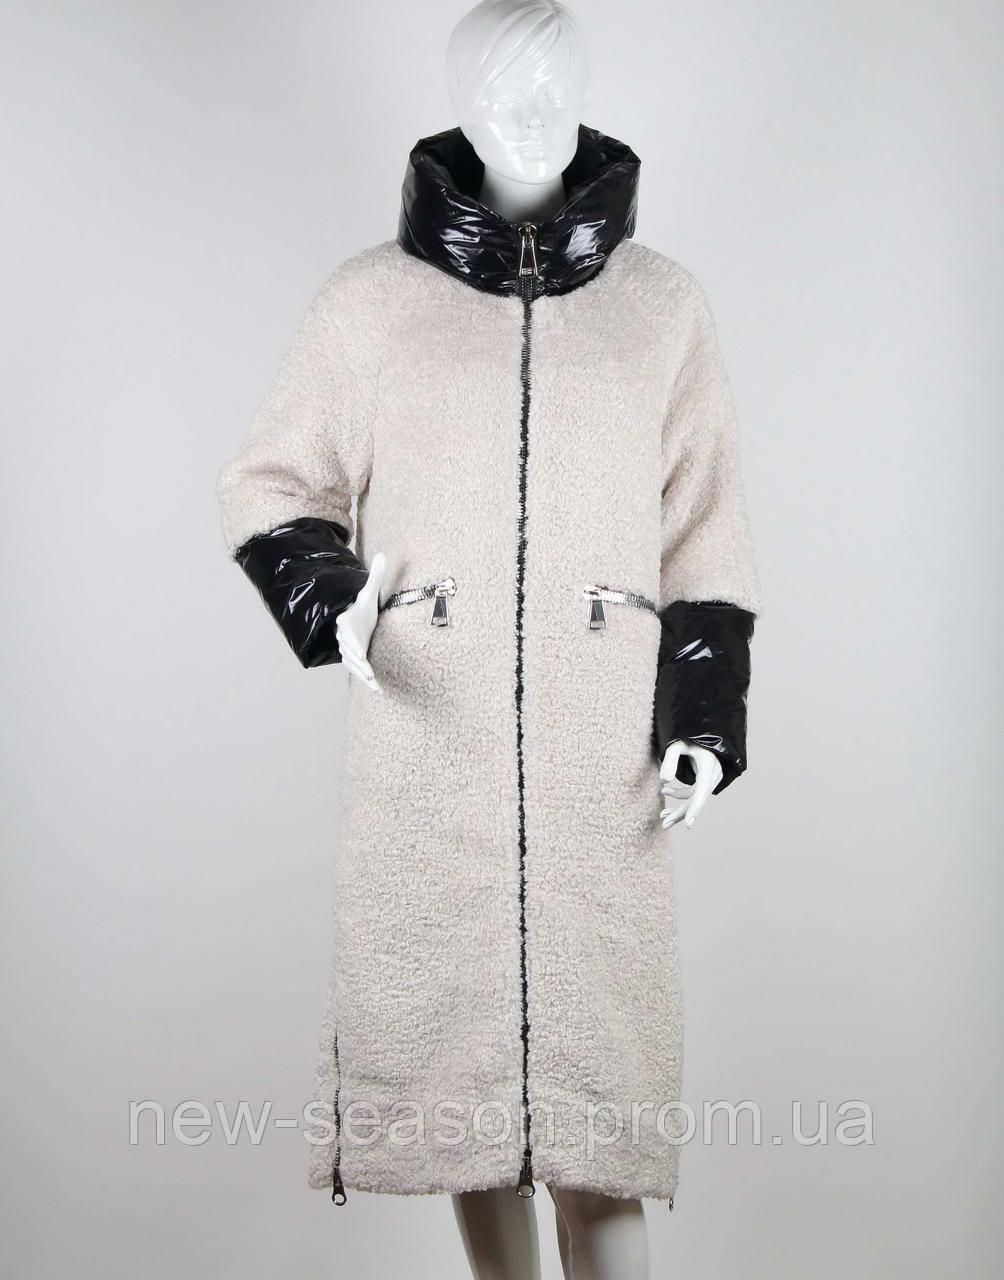 Пальто на натуральном пуху Chiago JF9669